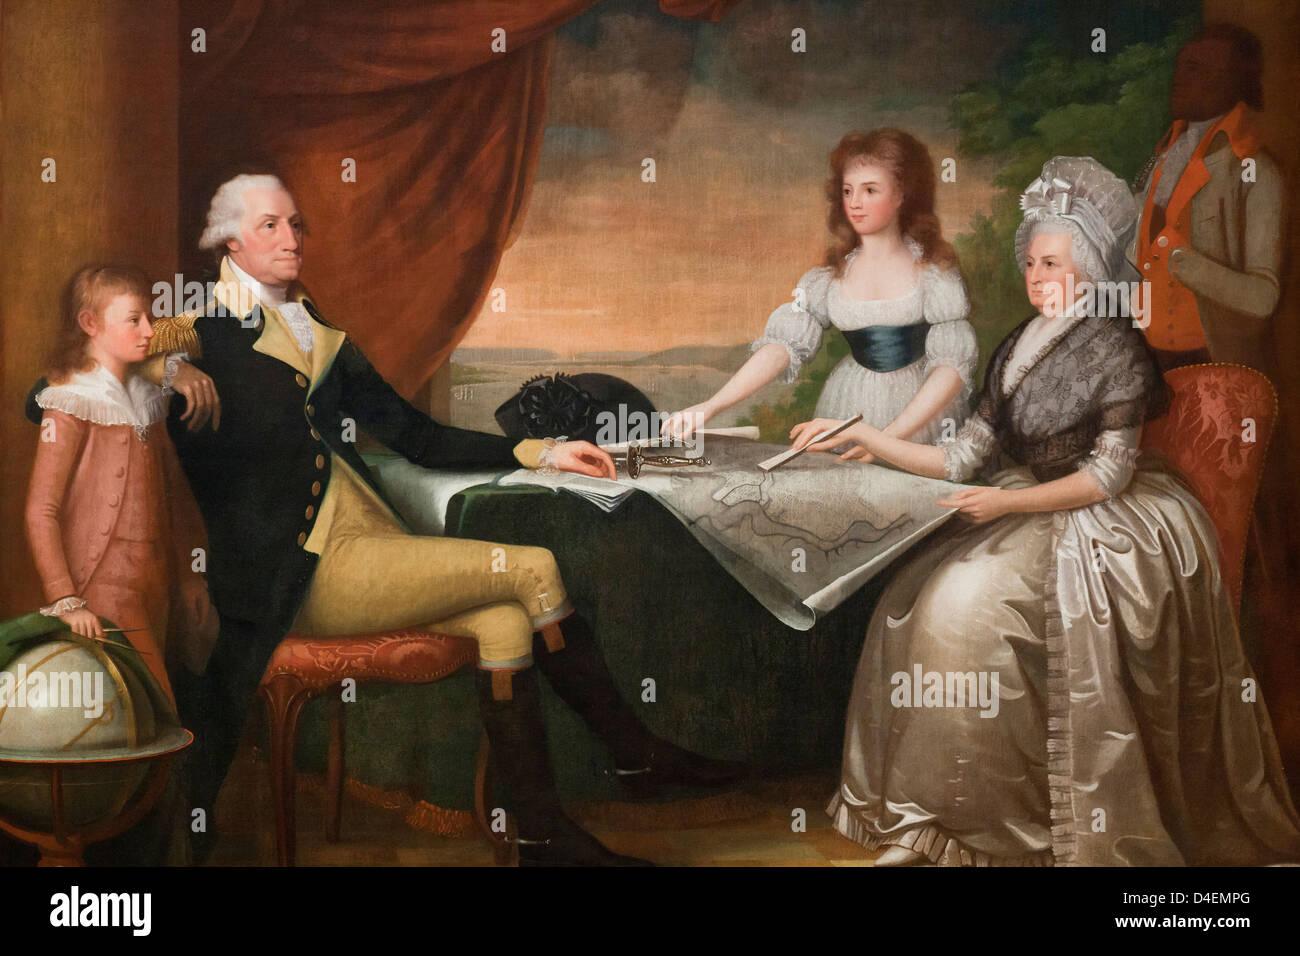 The Washington Family by Edward Savage, 1790 - National Gallery of Art, Washington, DC USA - Stock Image